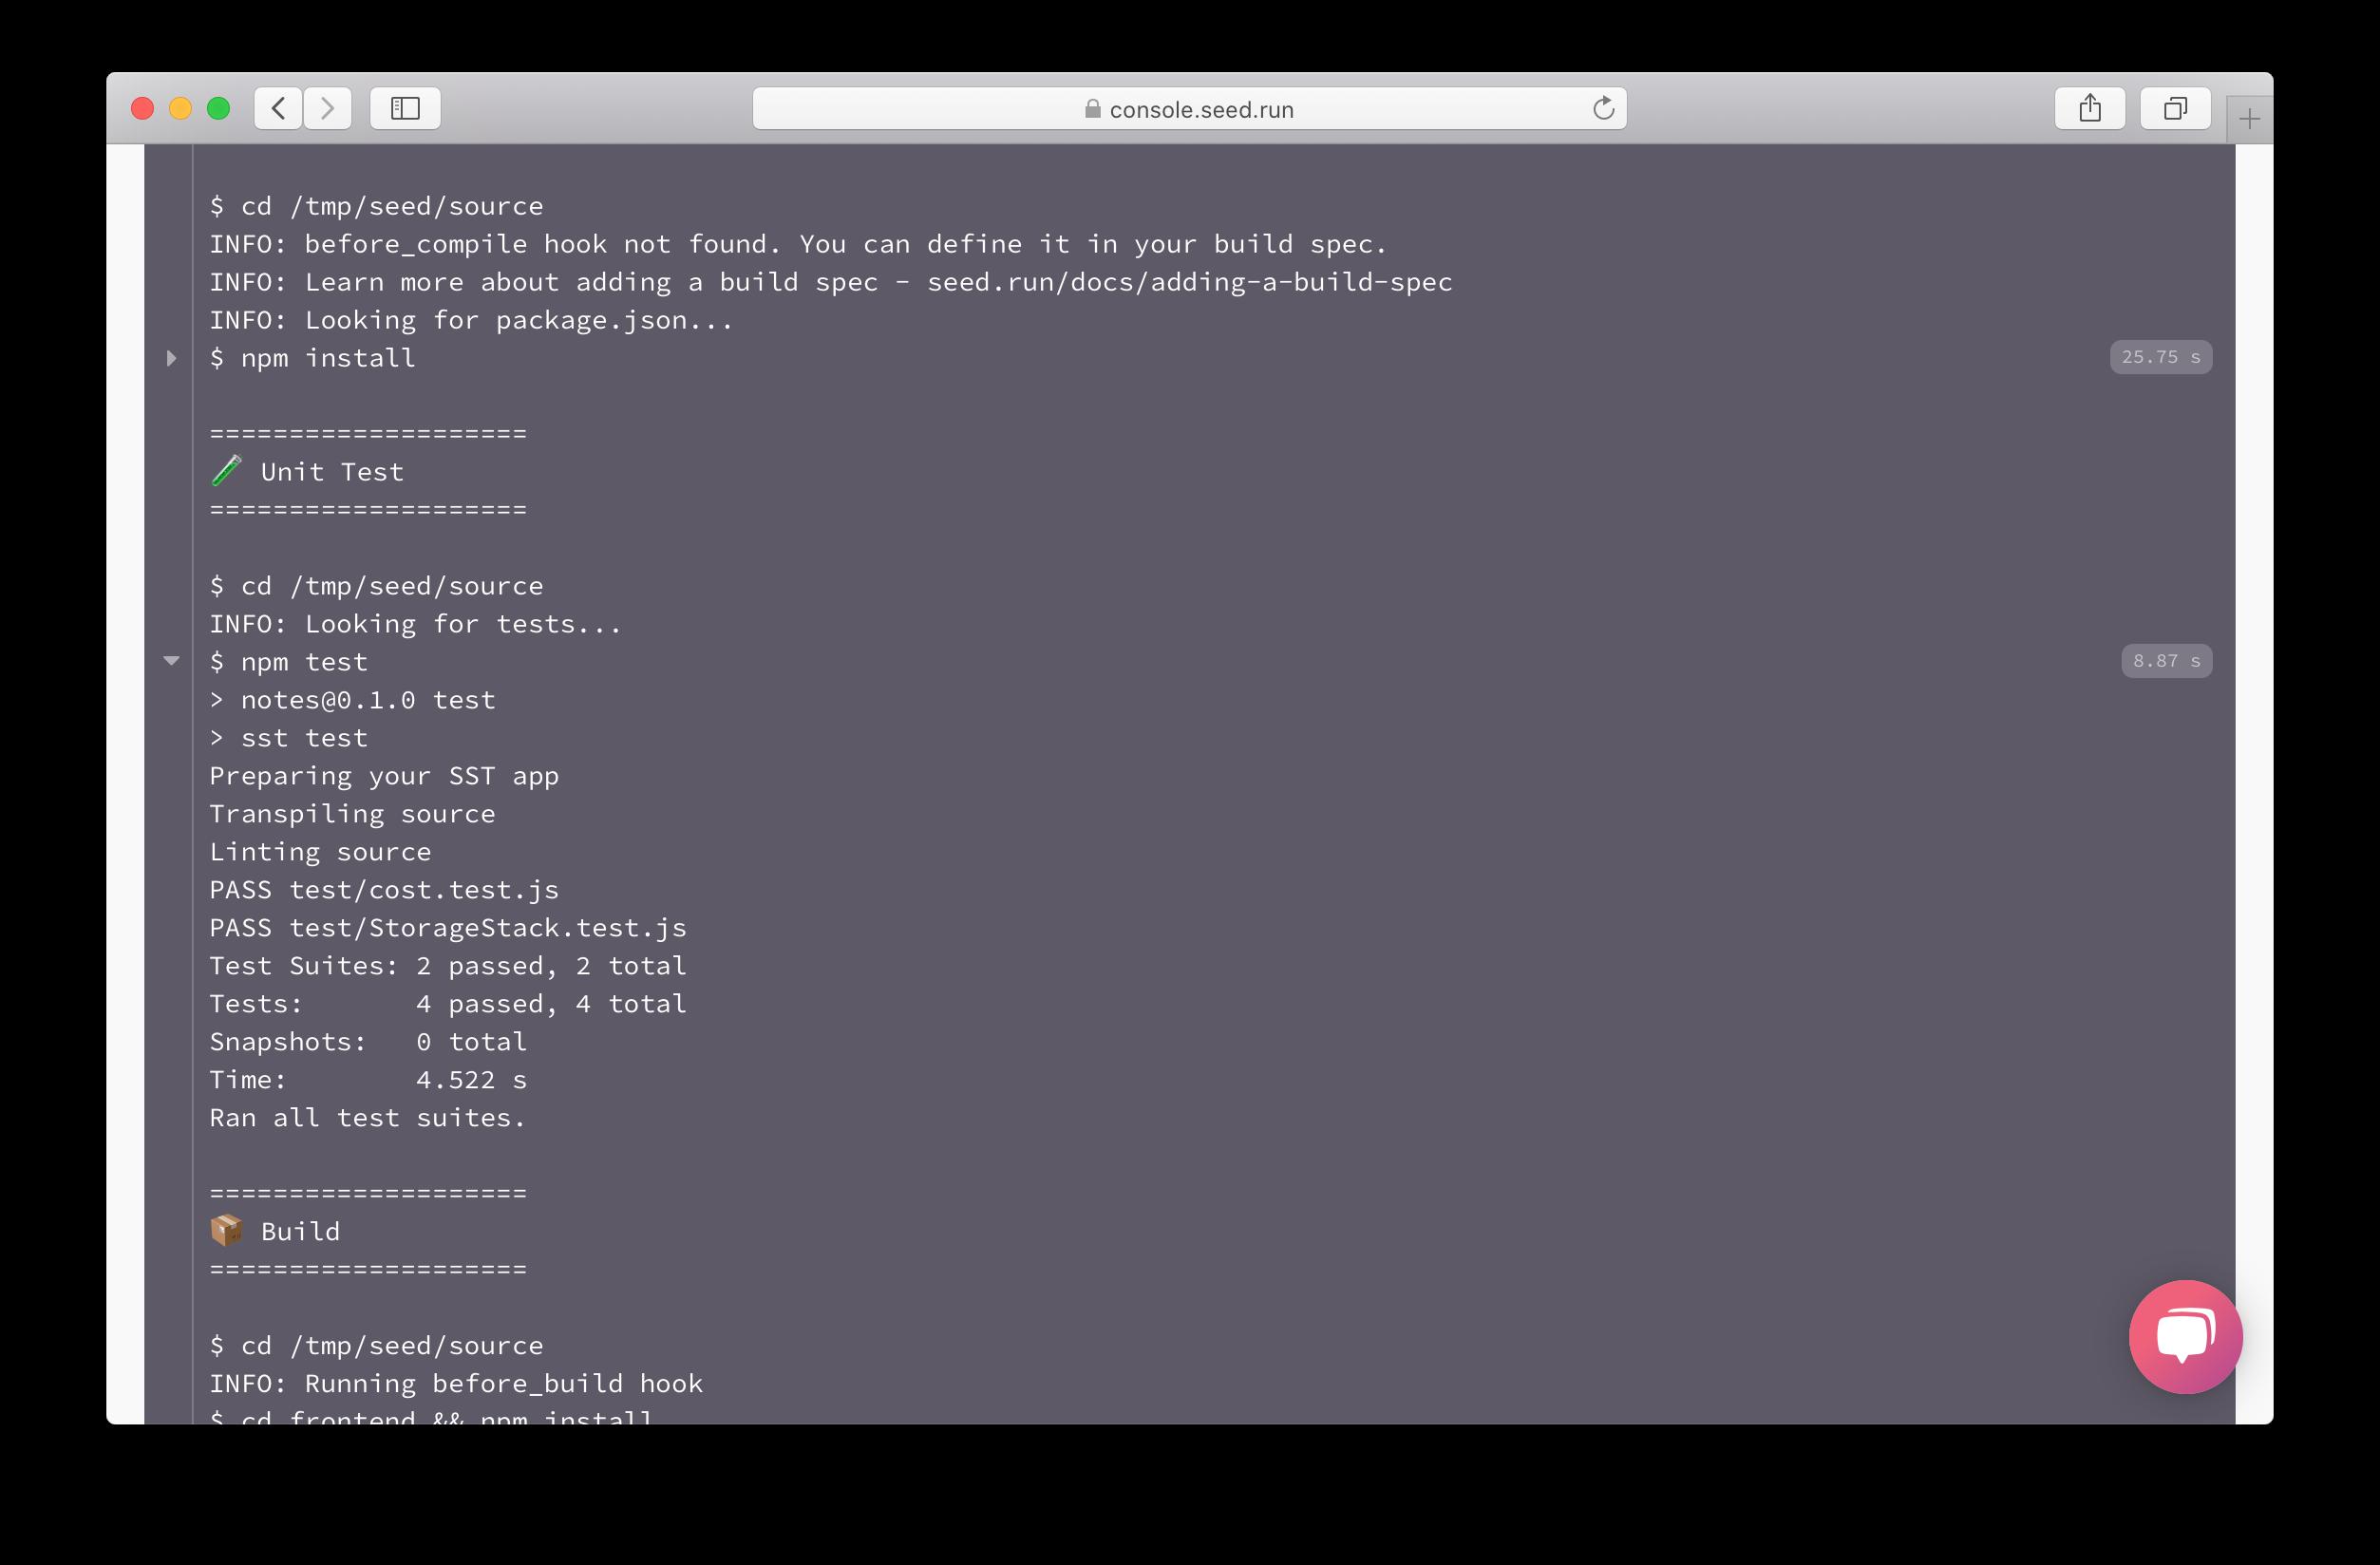 Prod build run tests